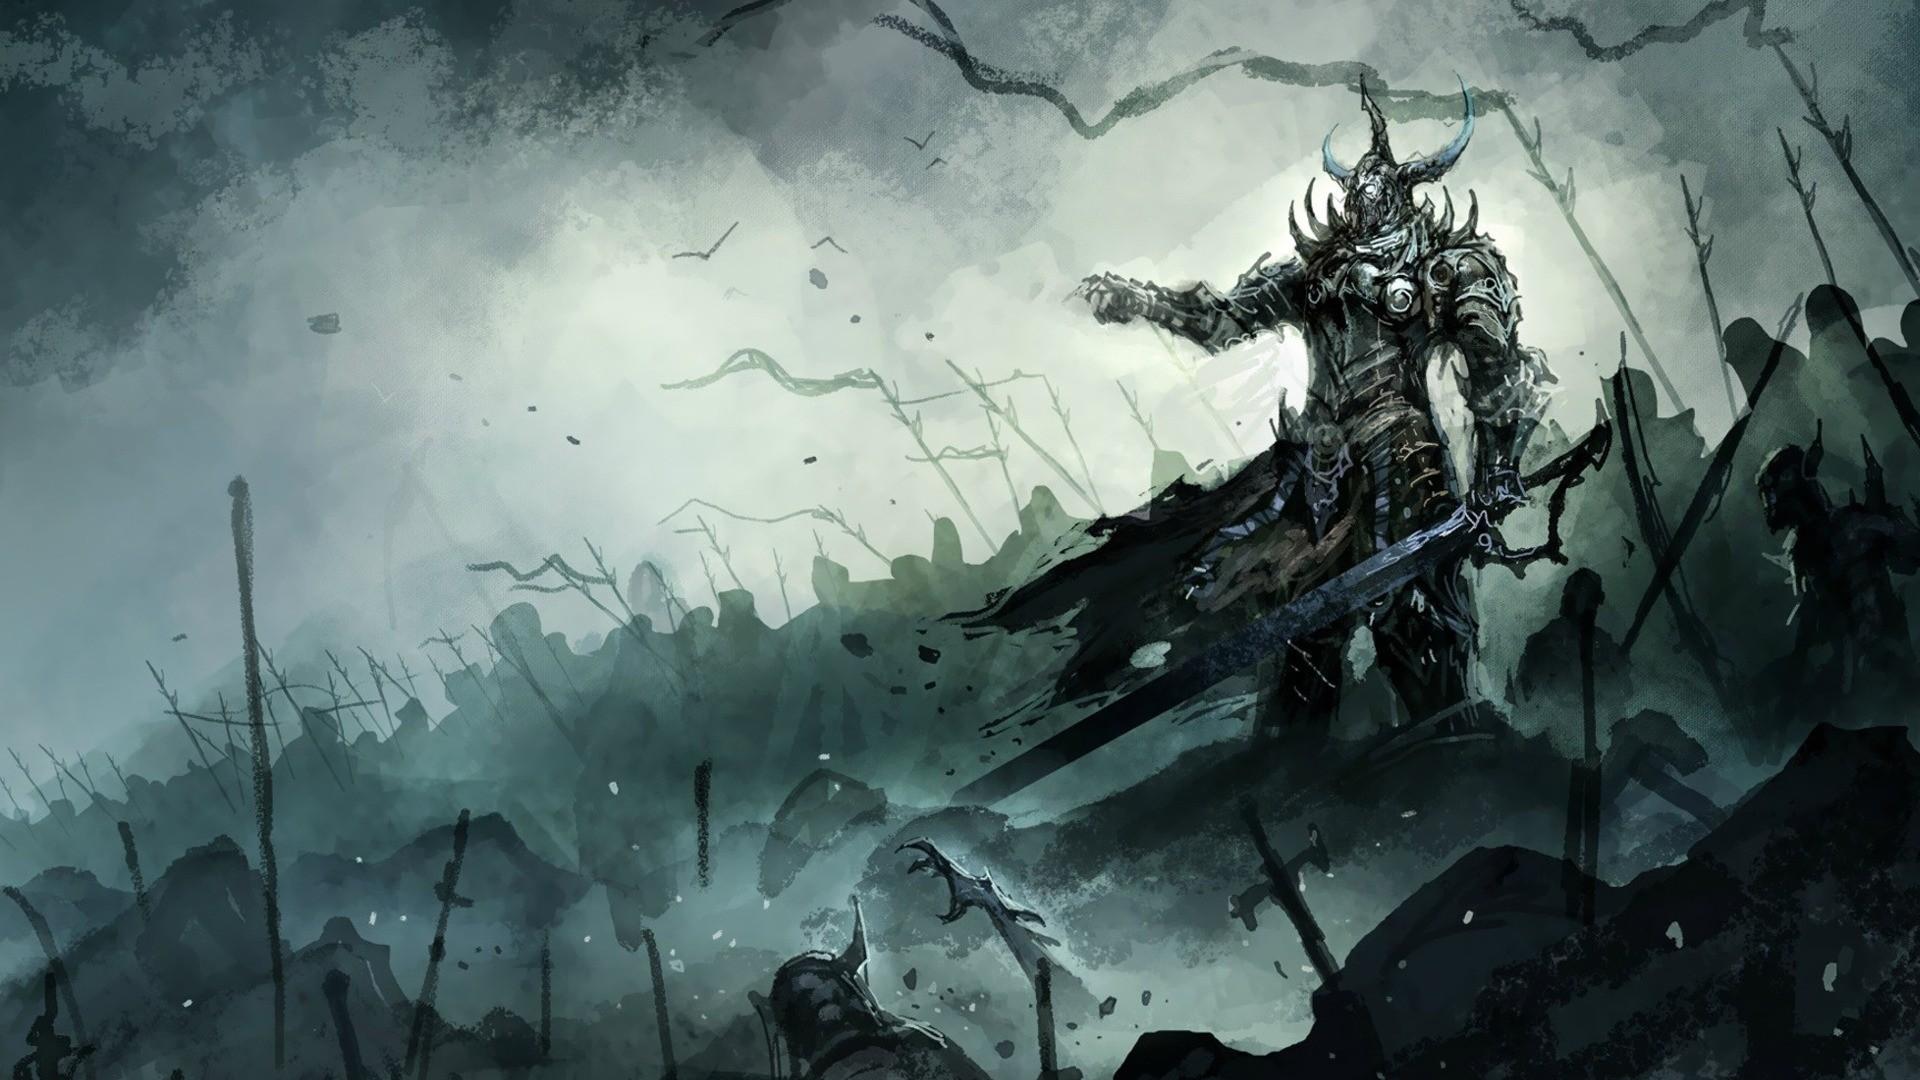 Res: 1920x1080, Epic Battle Fantasy Wallpaper